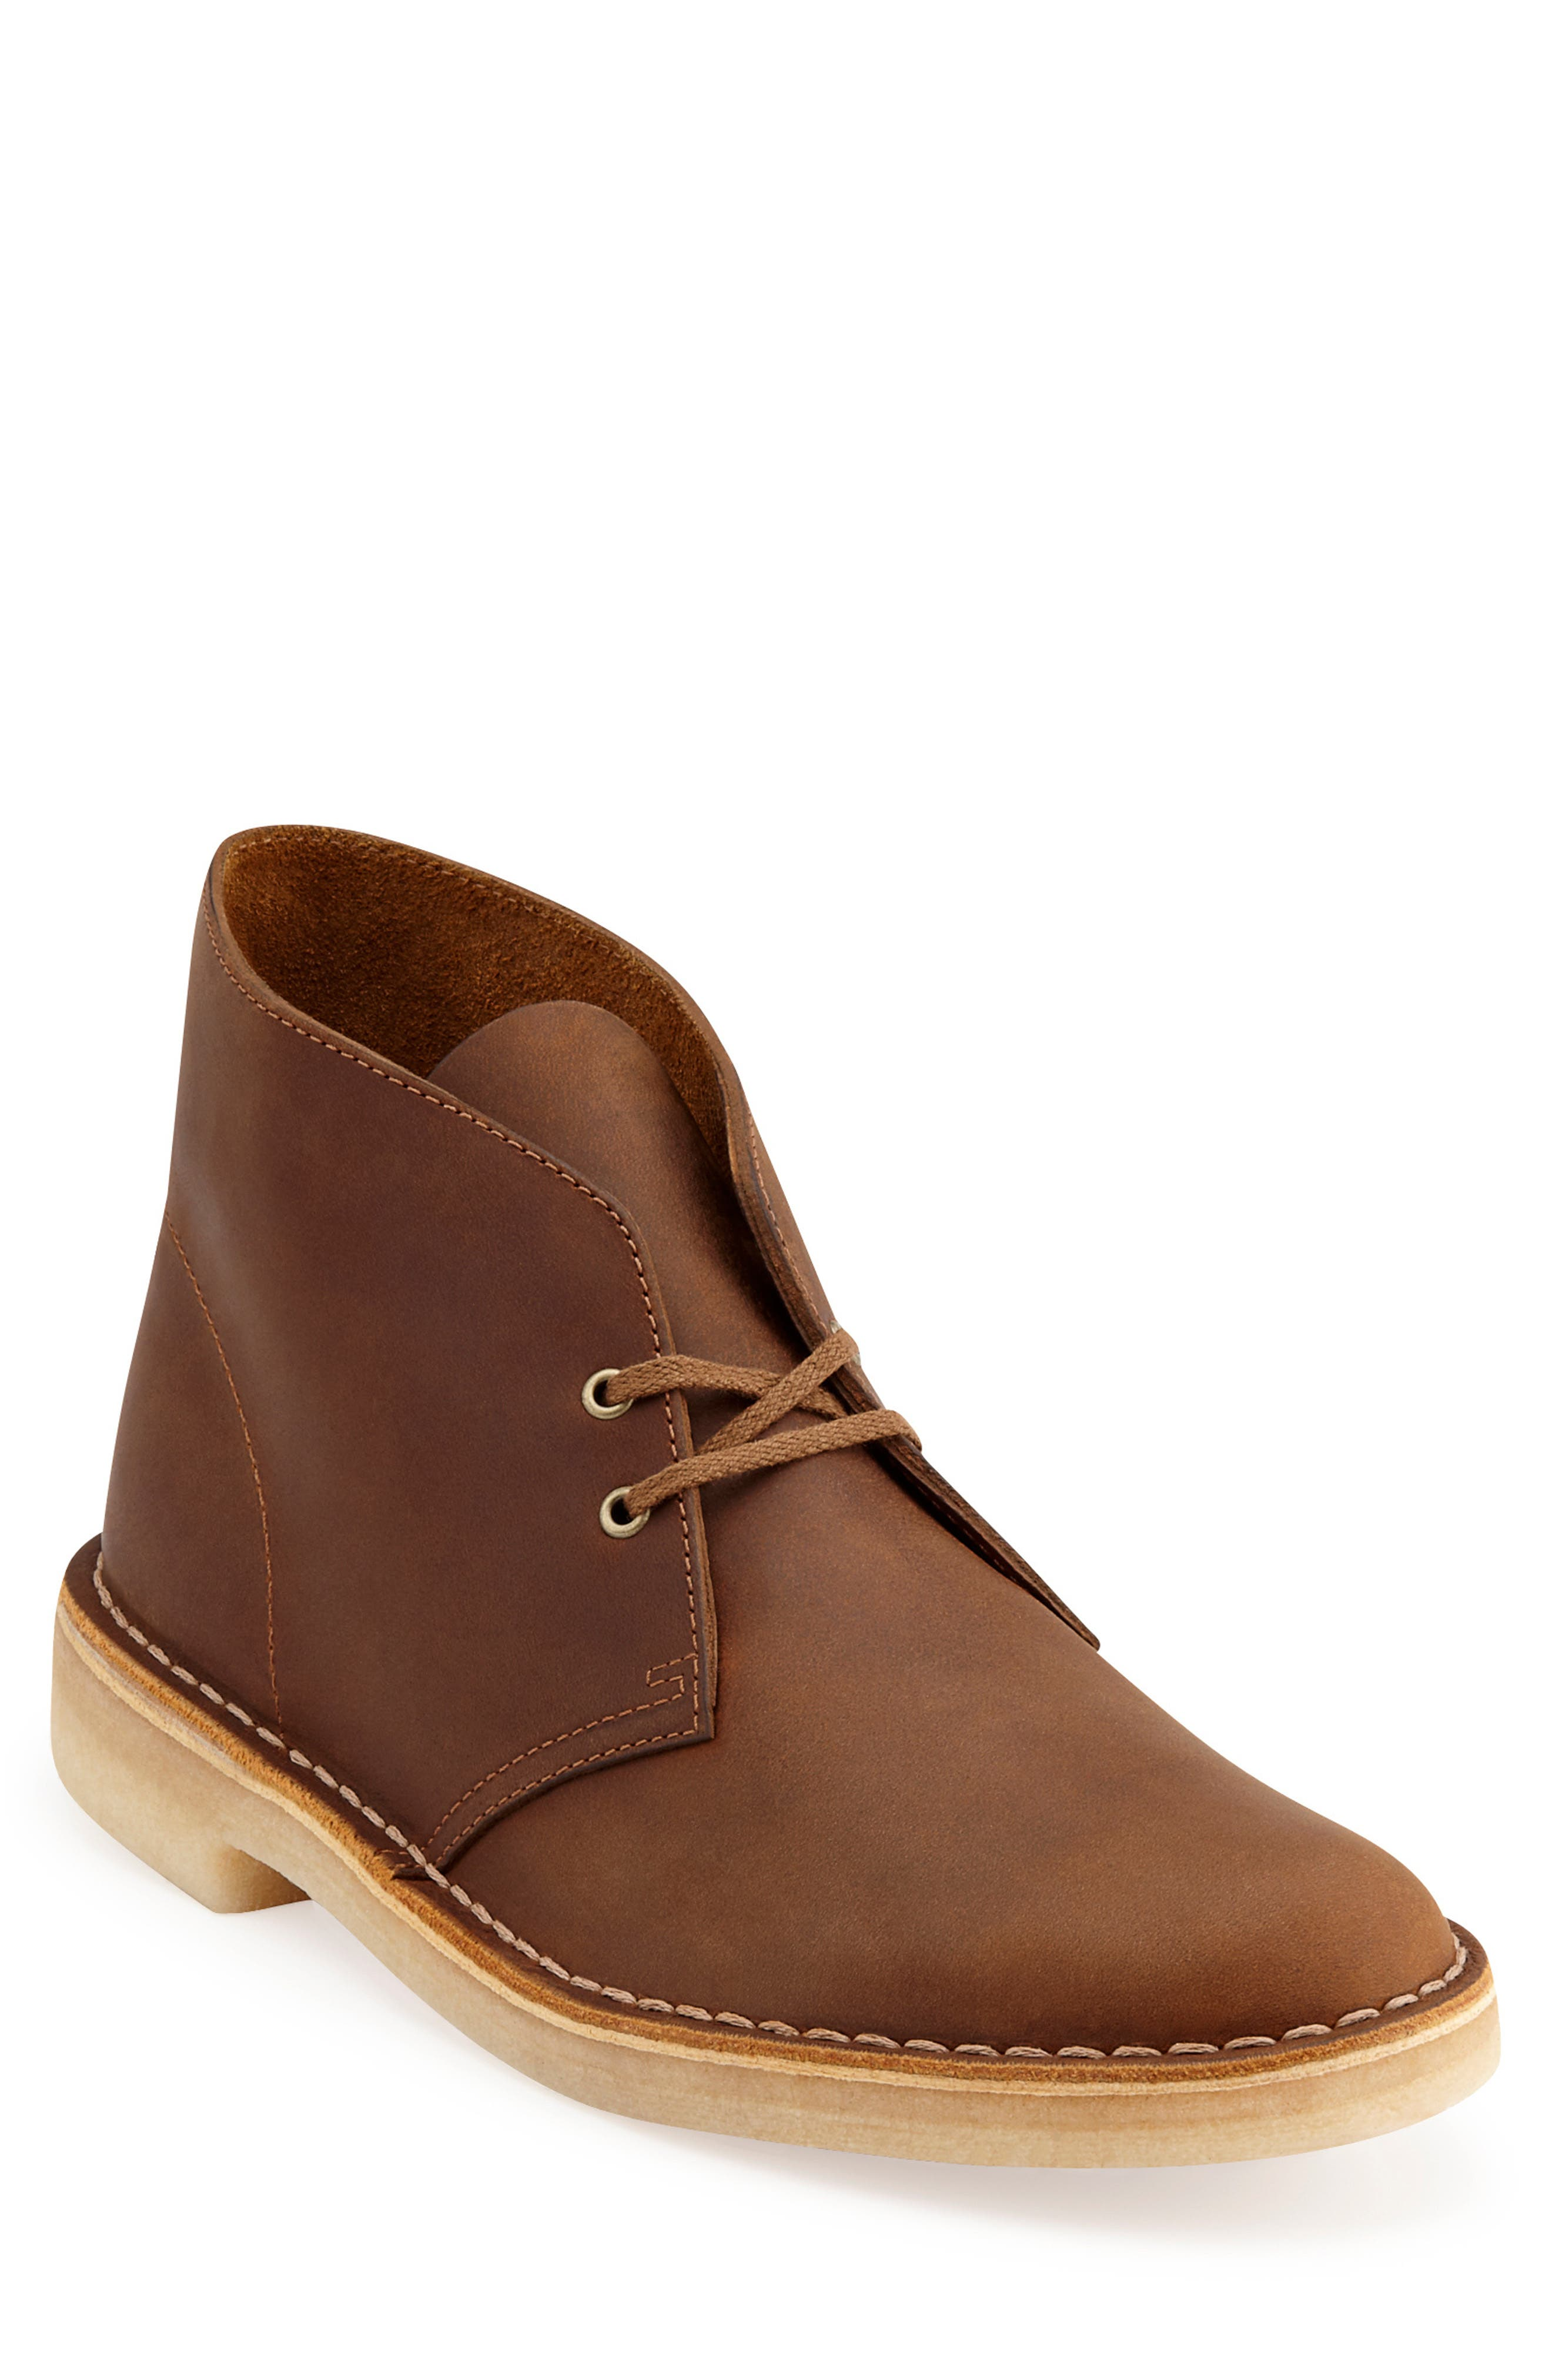 60s Mens Shoes | 70s Mens shoes – Platforms, Boots Mens Clarks Originals Desert Boot $140.00 AT vintagedancer.com